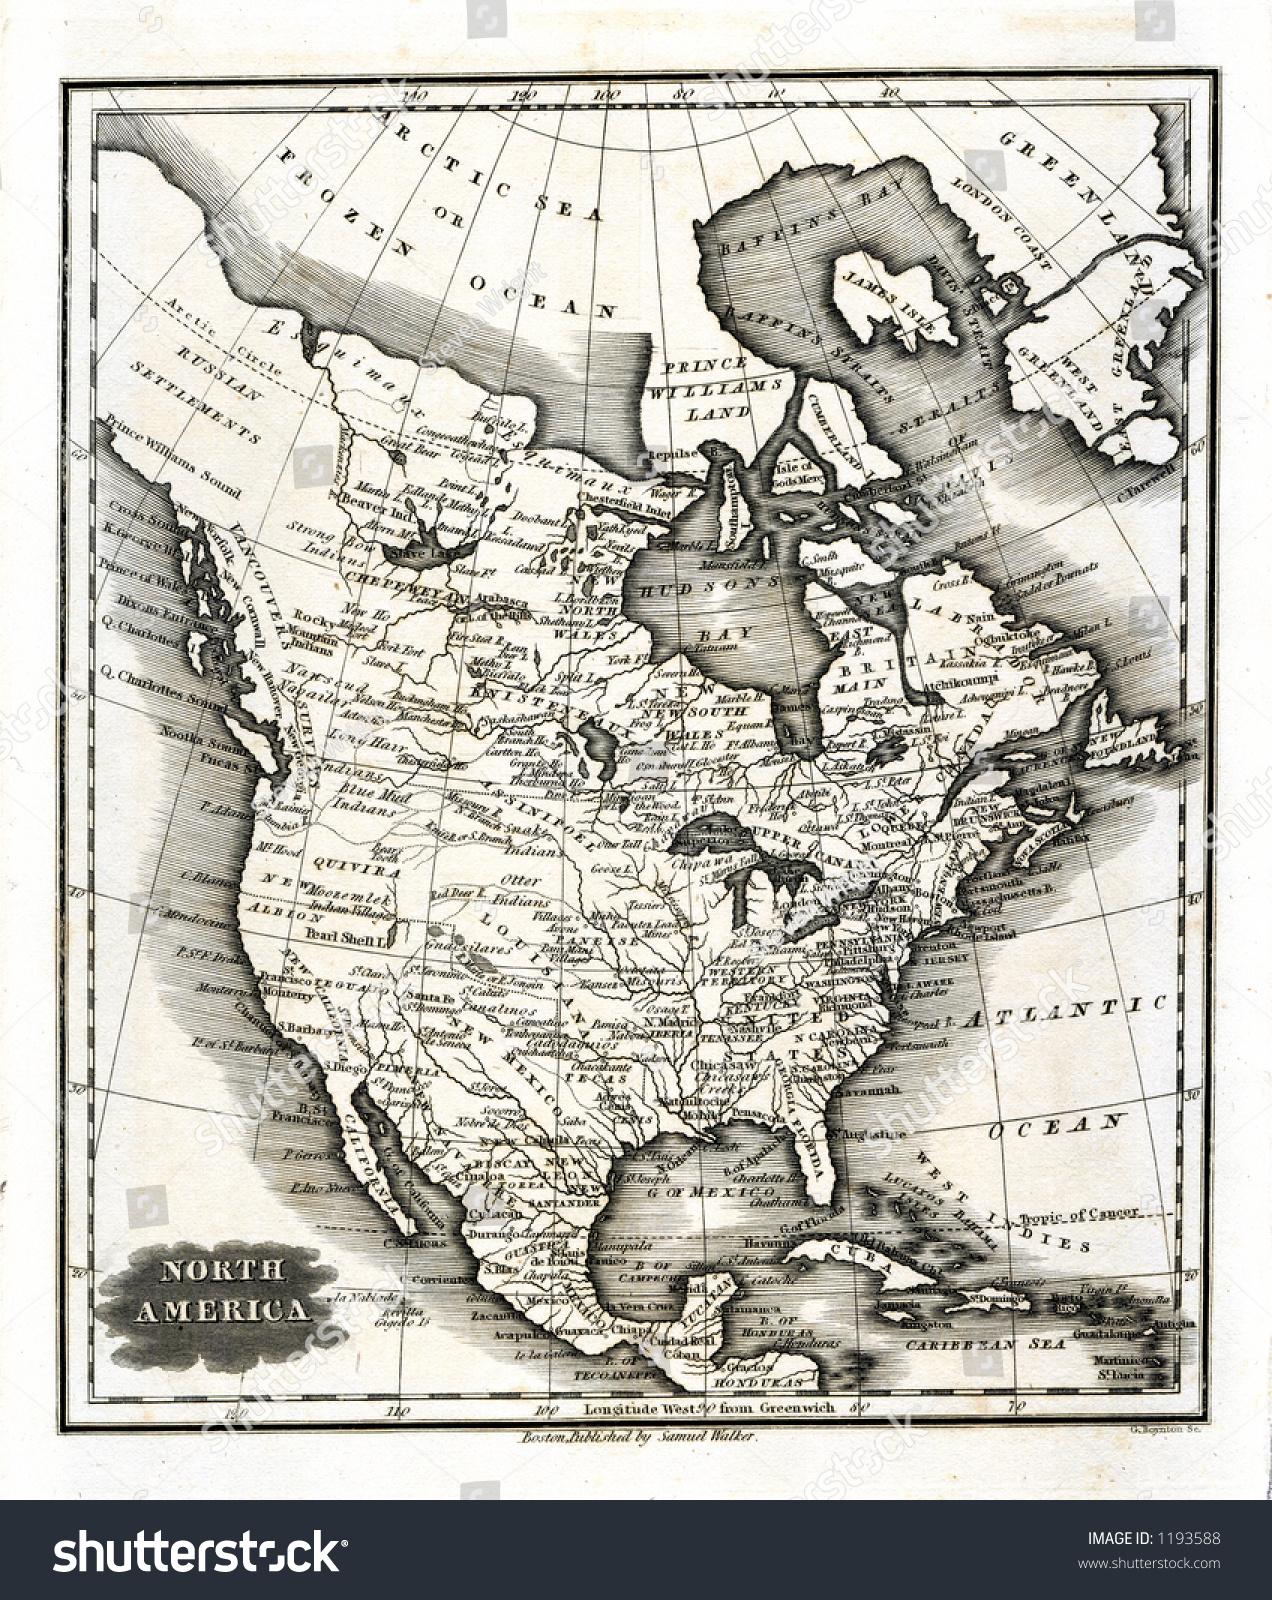 Antique Map Of North America.1799 Antique Map North America United Stock Illustration 1193588